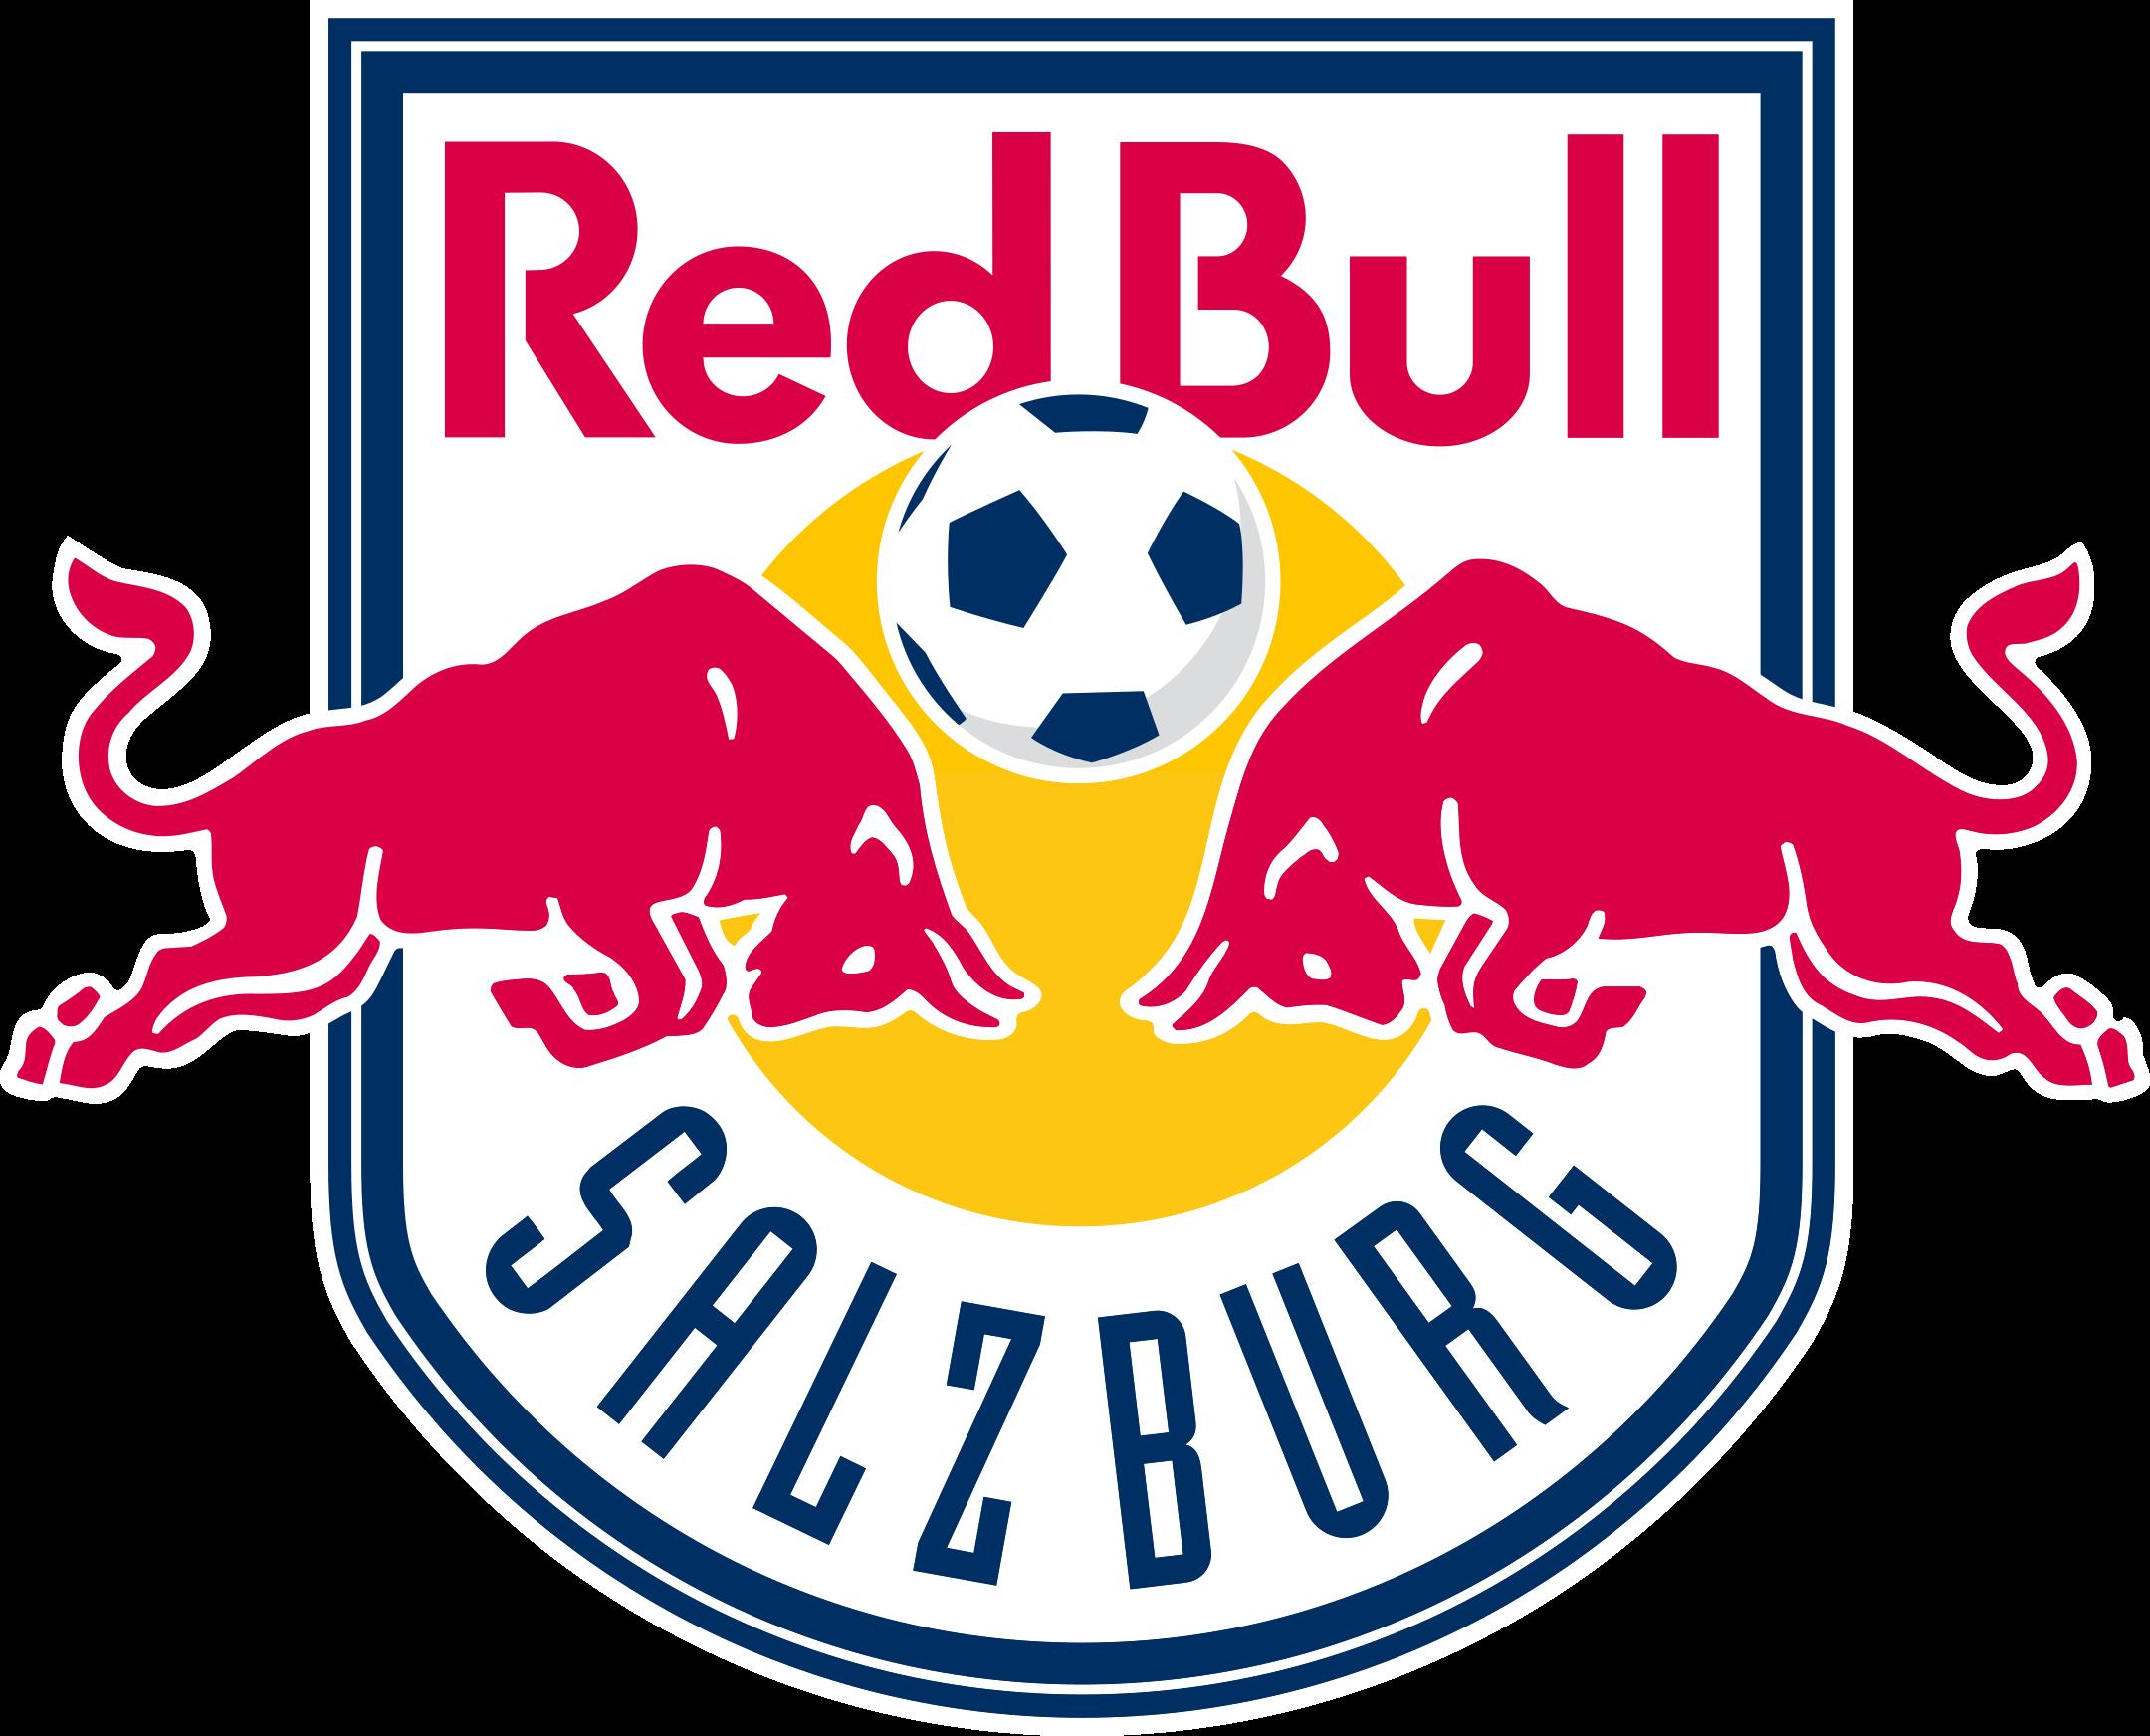 redbull salzburg logo 1 - Red Bull Salzburg Logo – Escudo